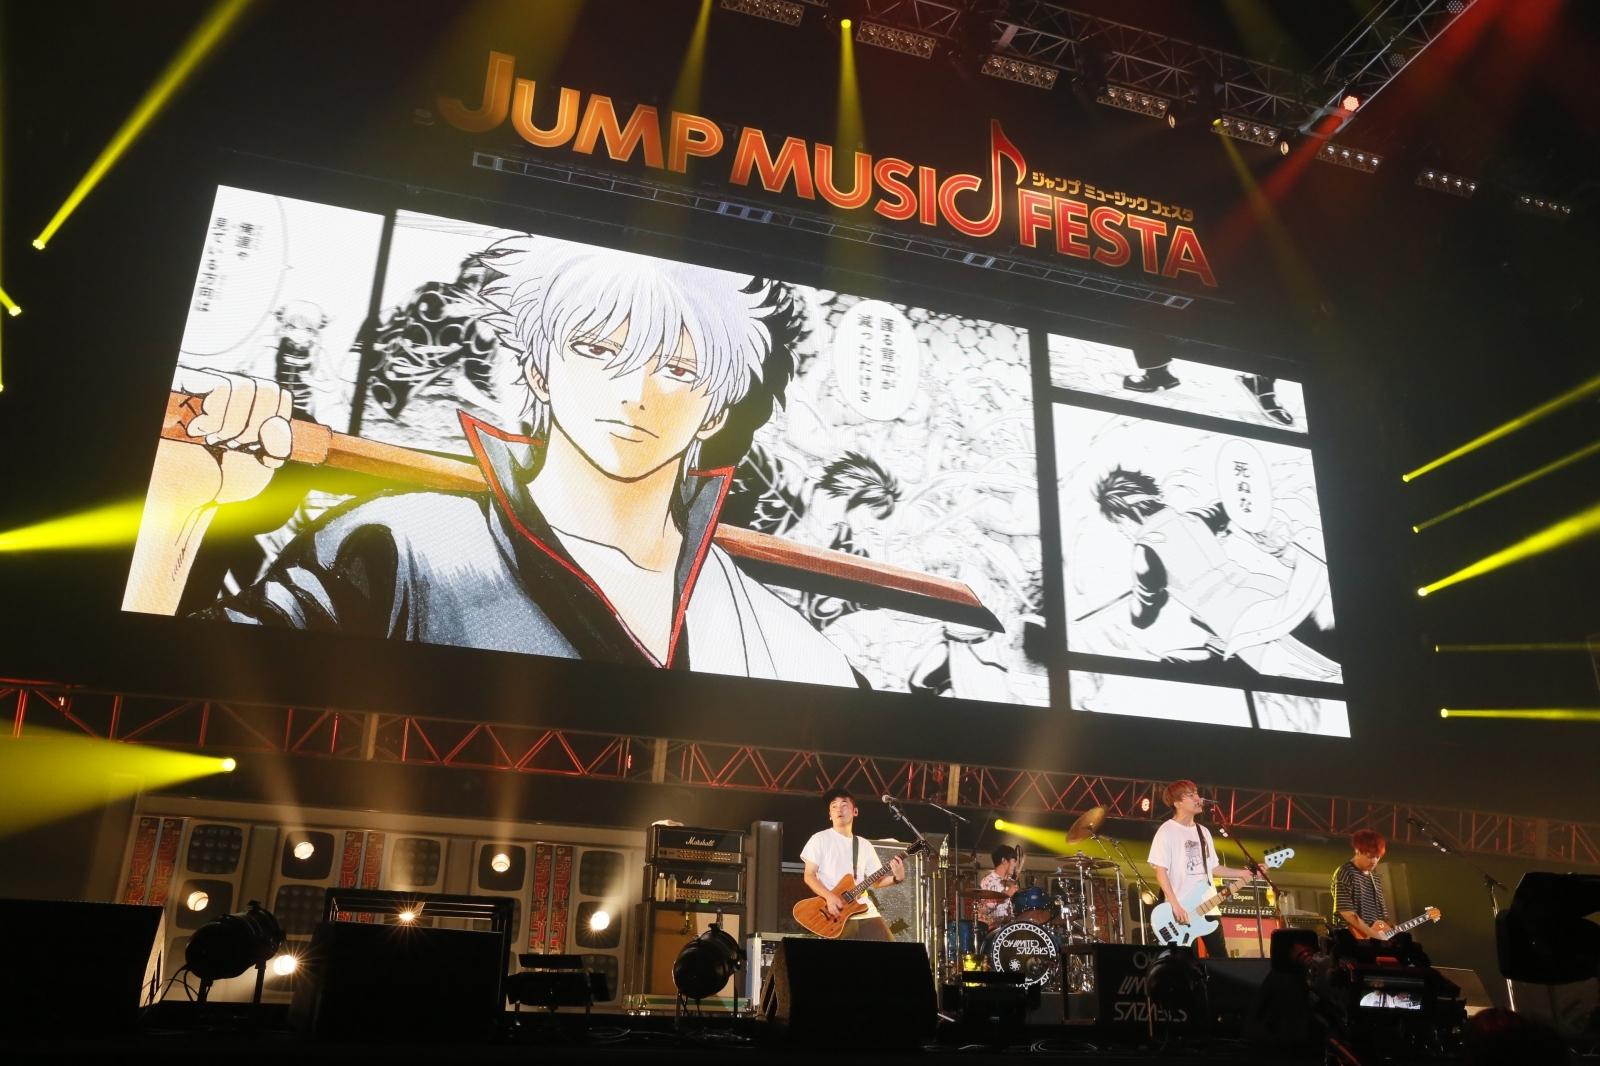 04 Limited Sazabys『JUMP MUSIC FESTA』